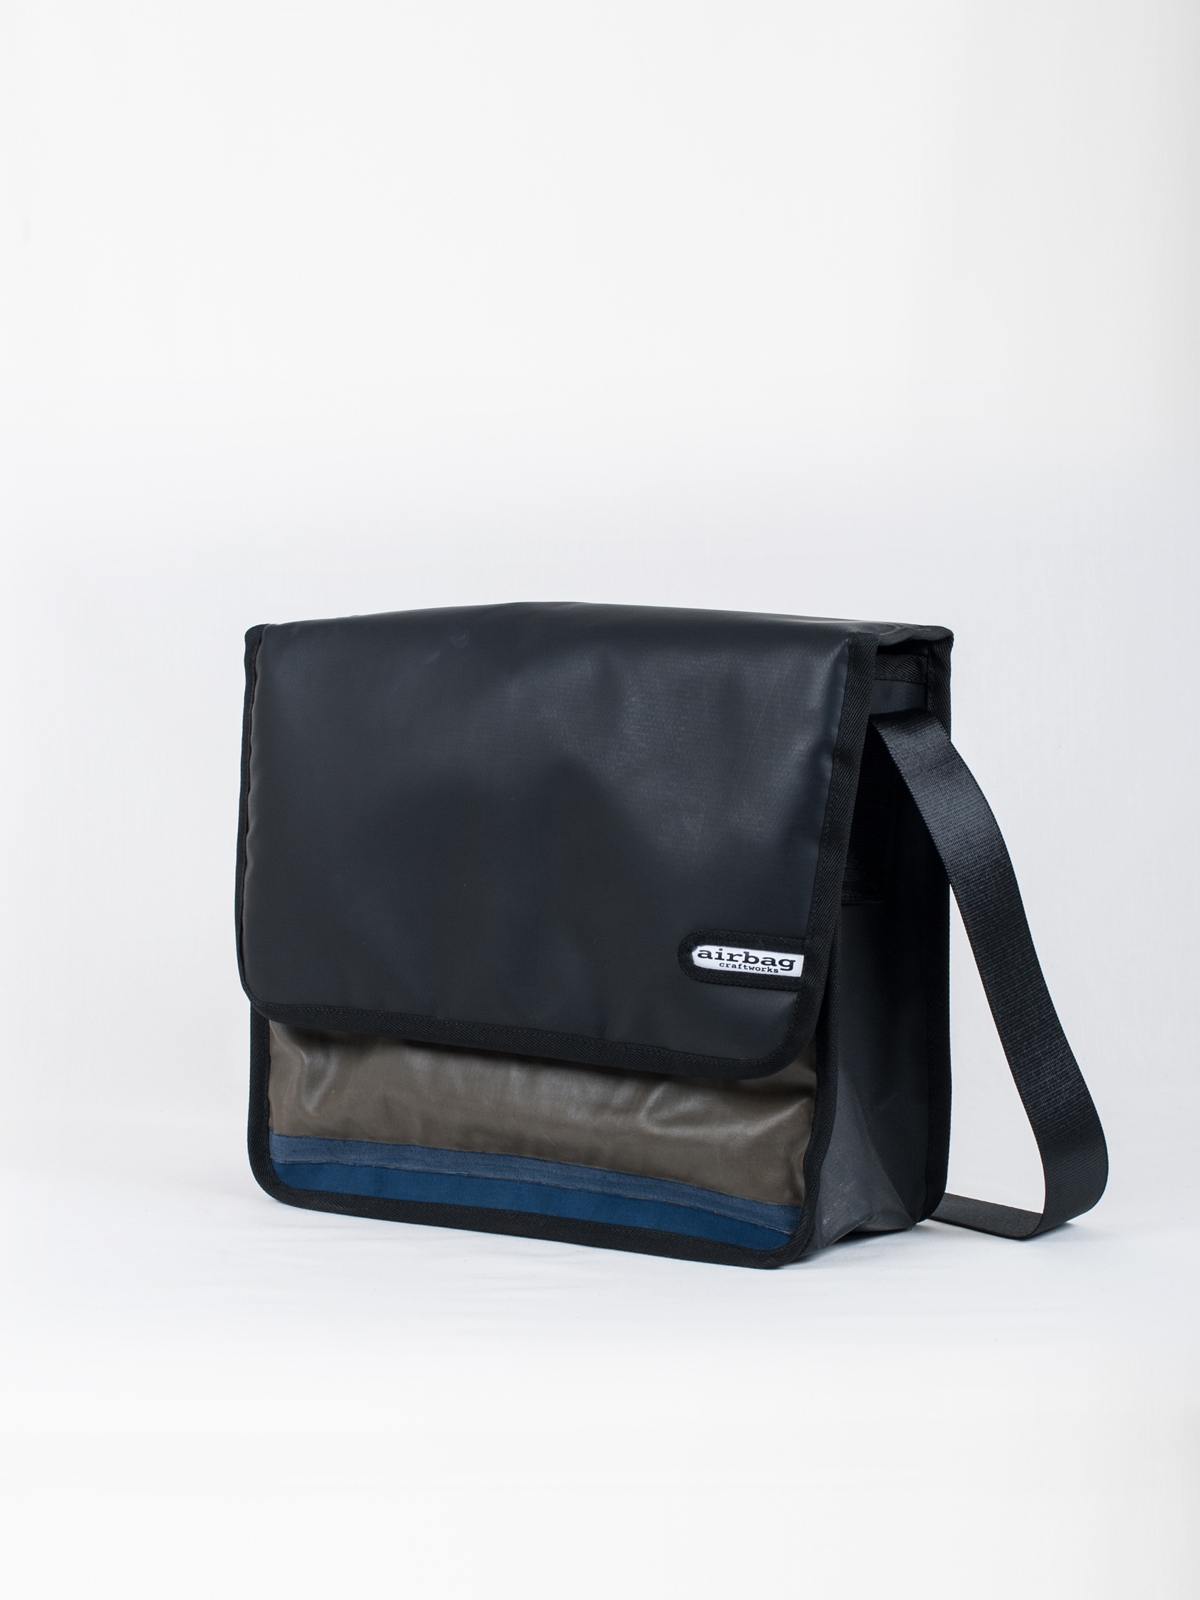 airbag craftworks 628